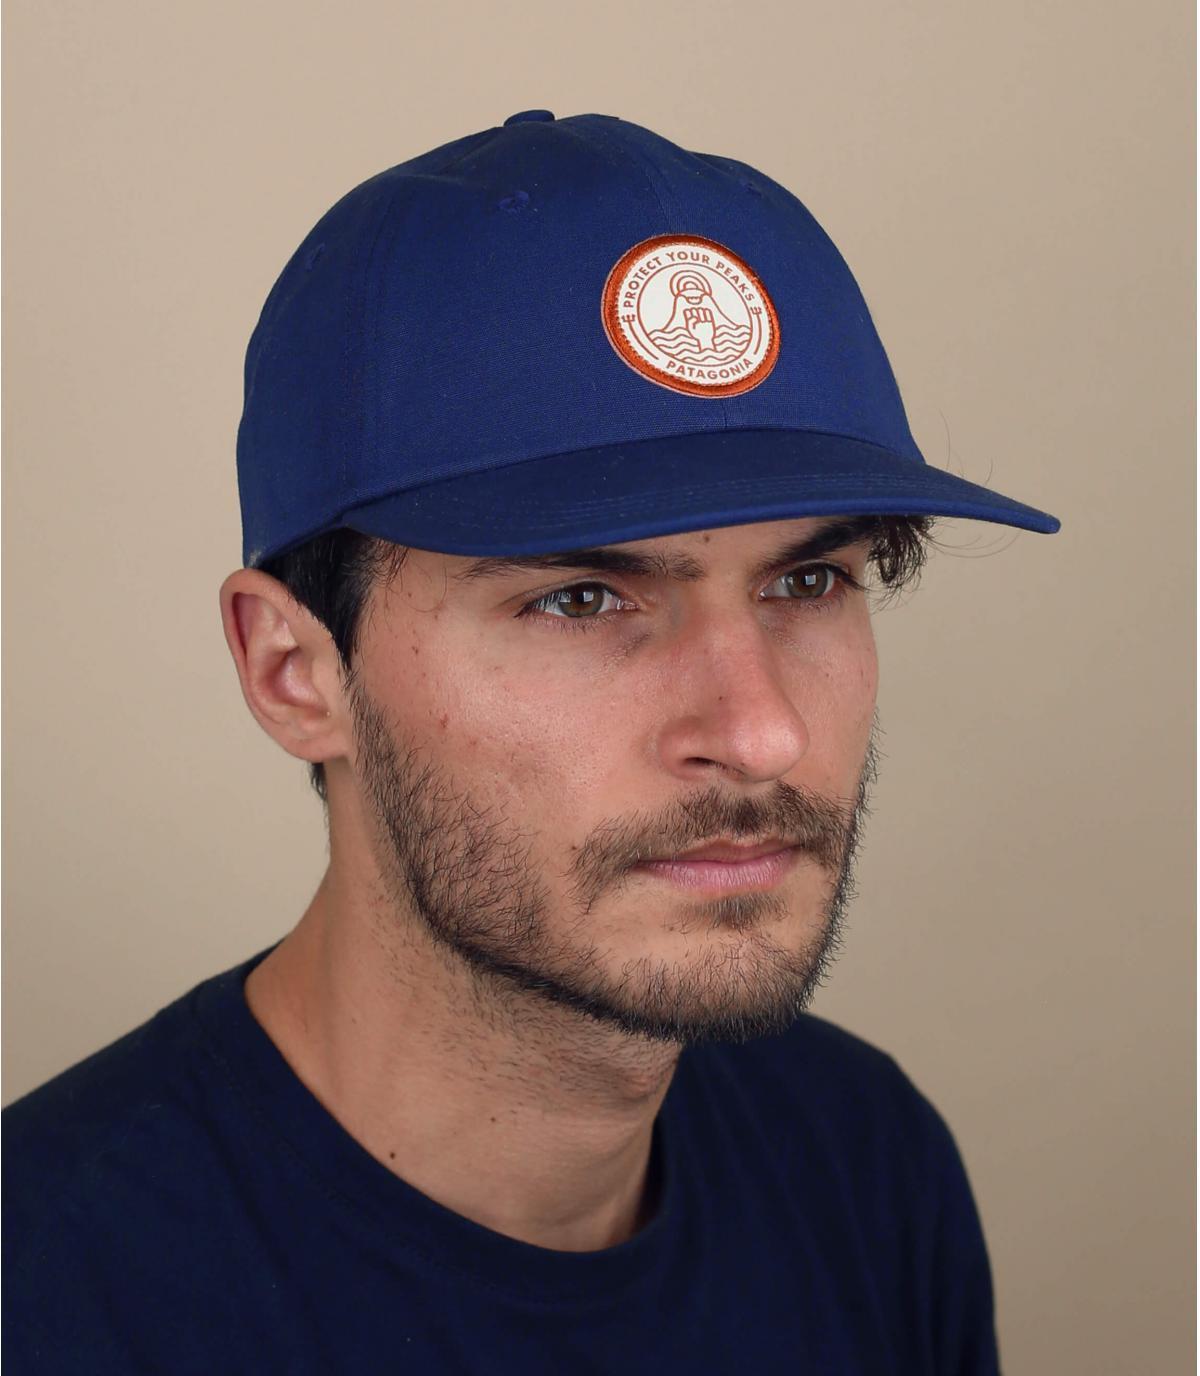 cappellino Patagonia onda blu